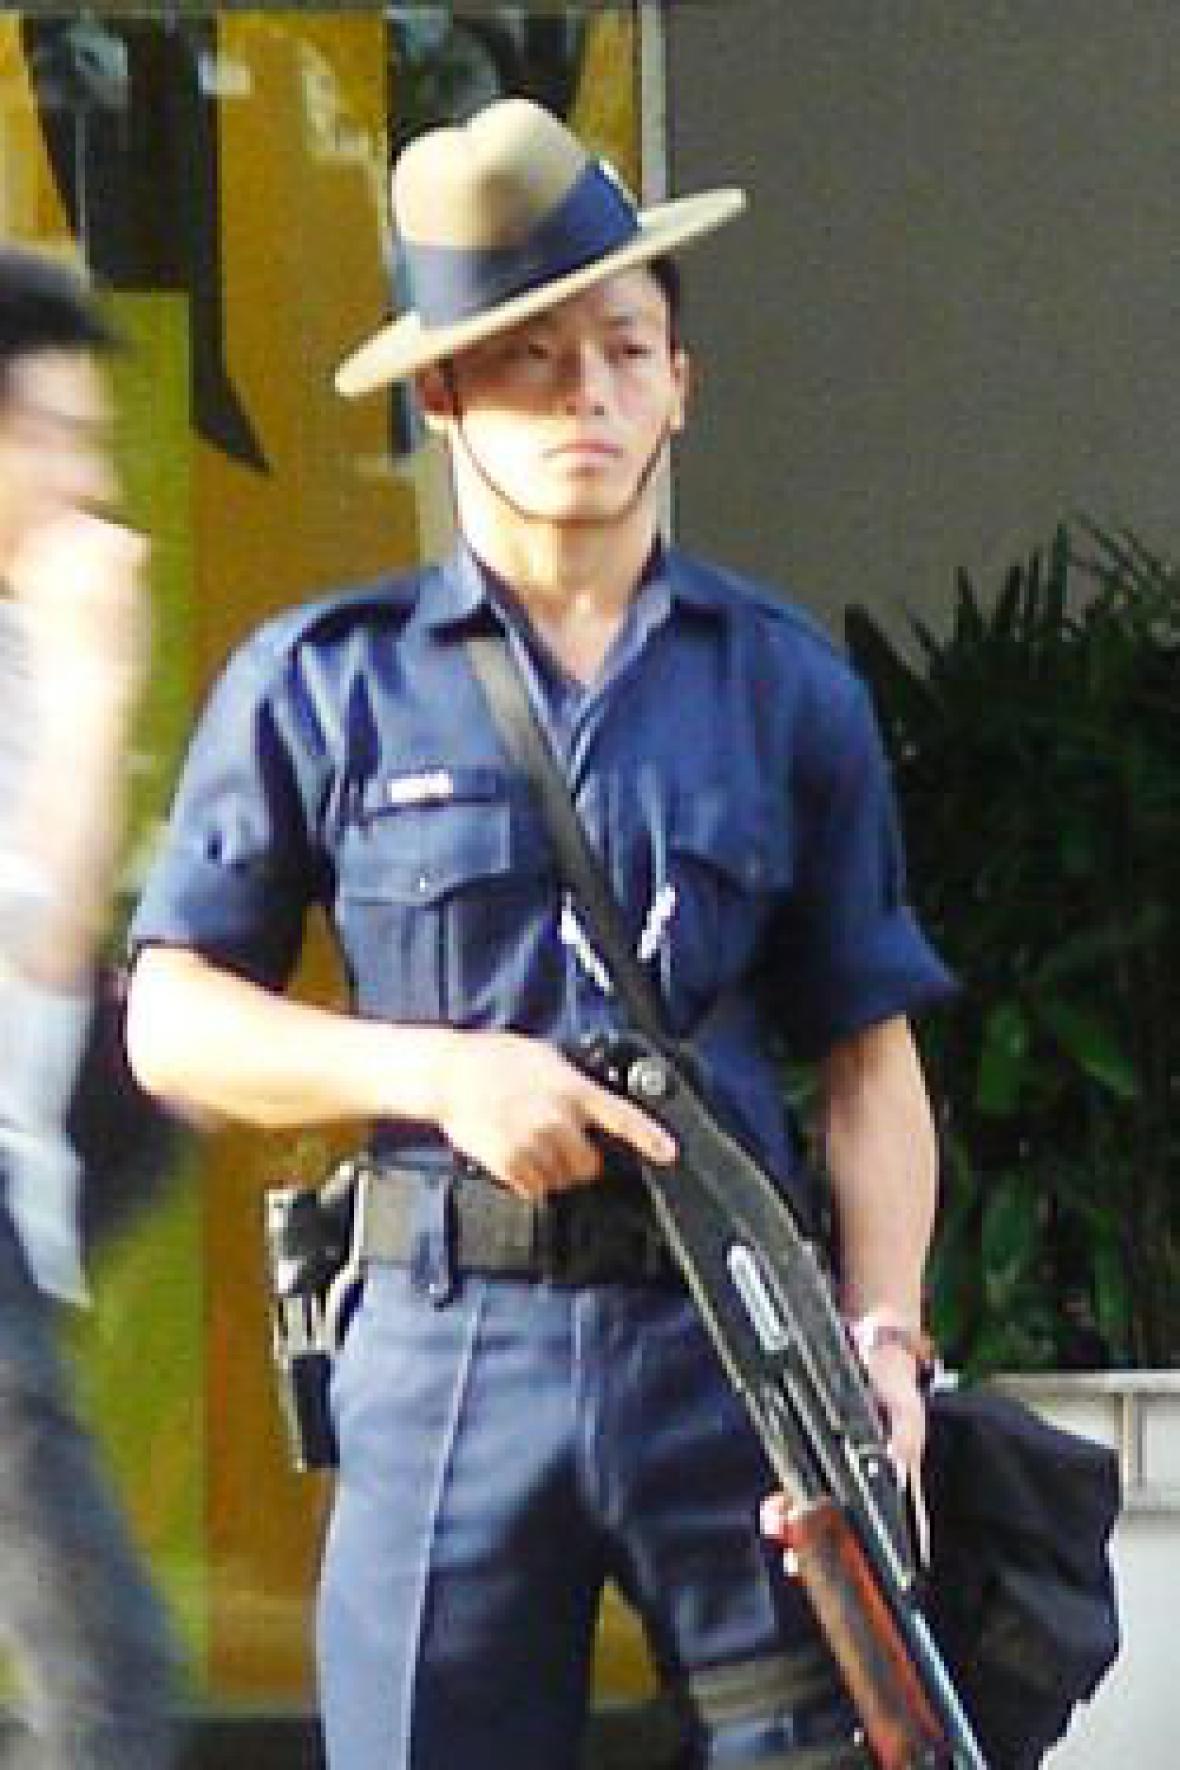 Gurkha u singapurské policie